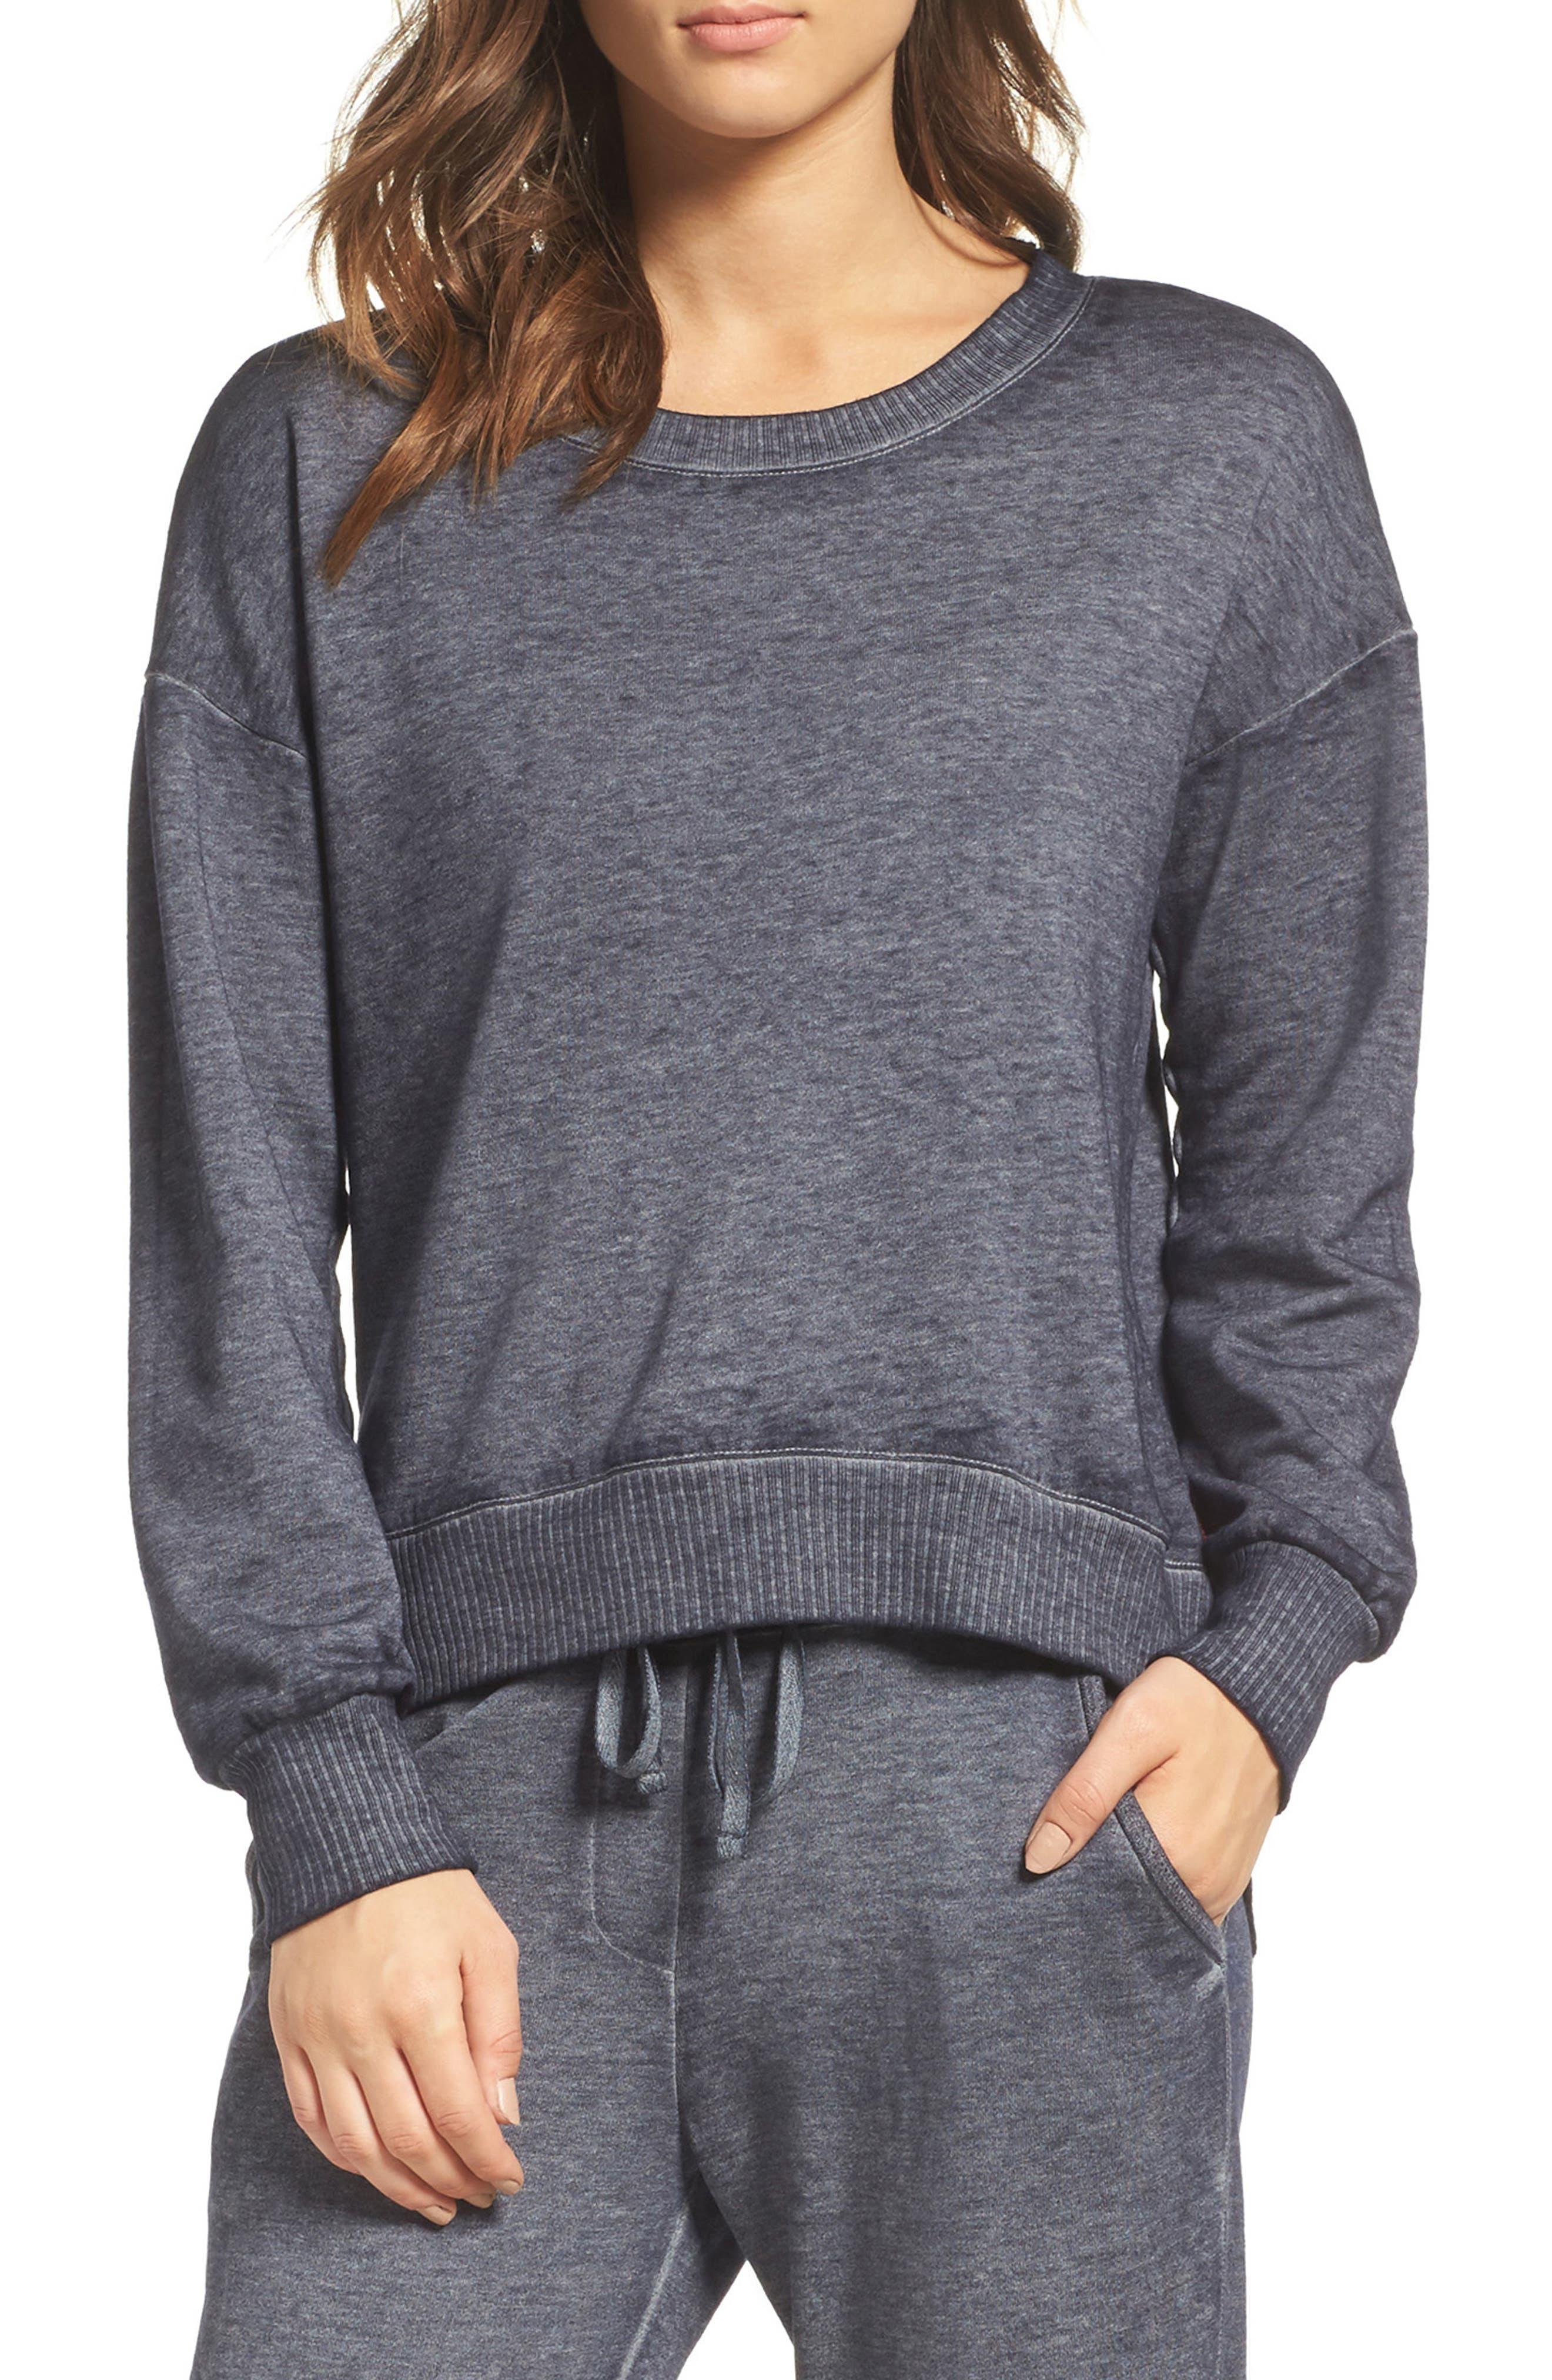 Main Image - Josie Sunset Blvd Pullover Sweatshirt